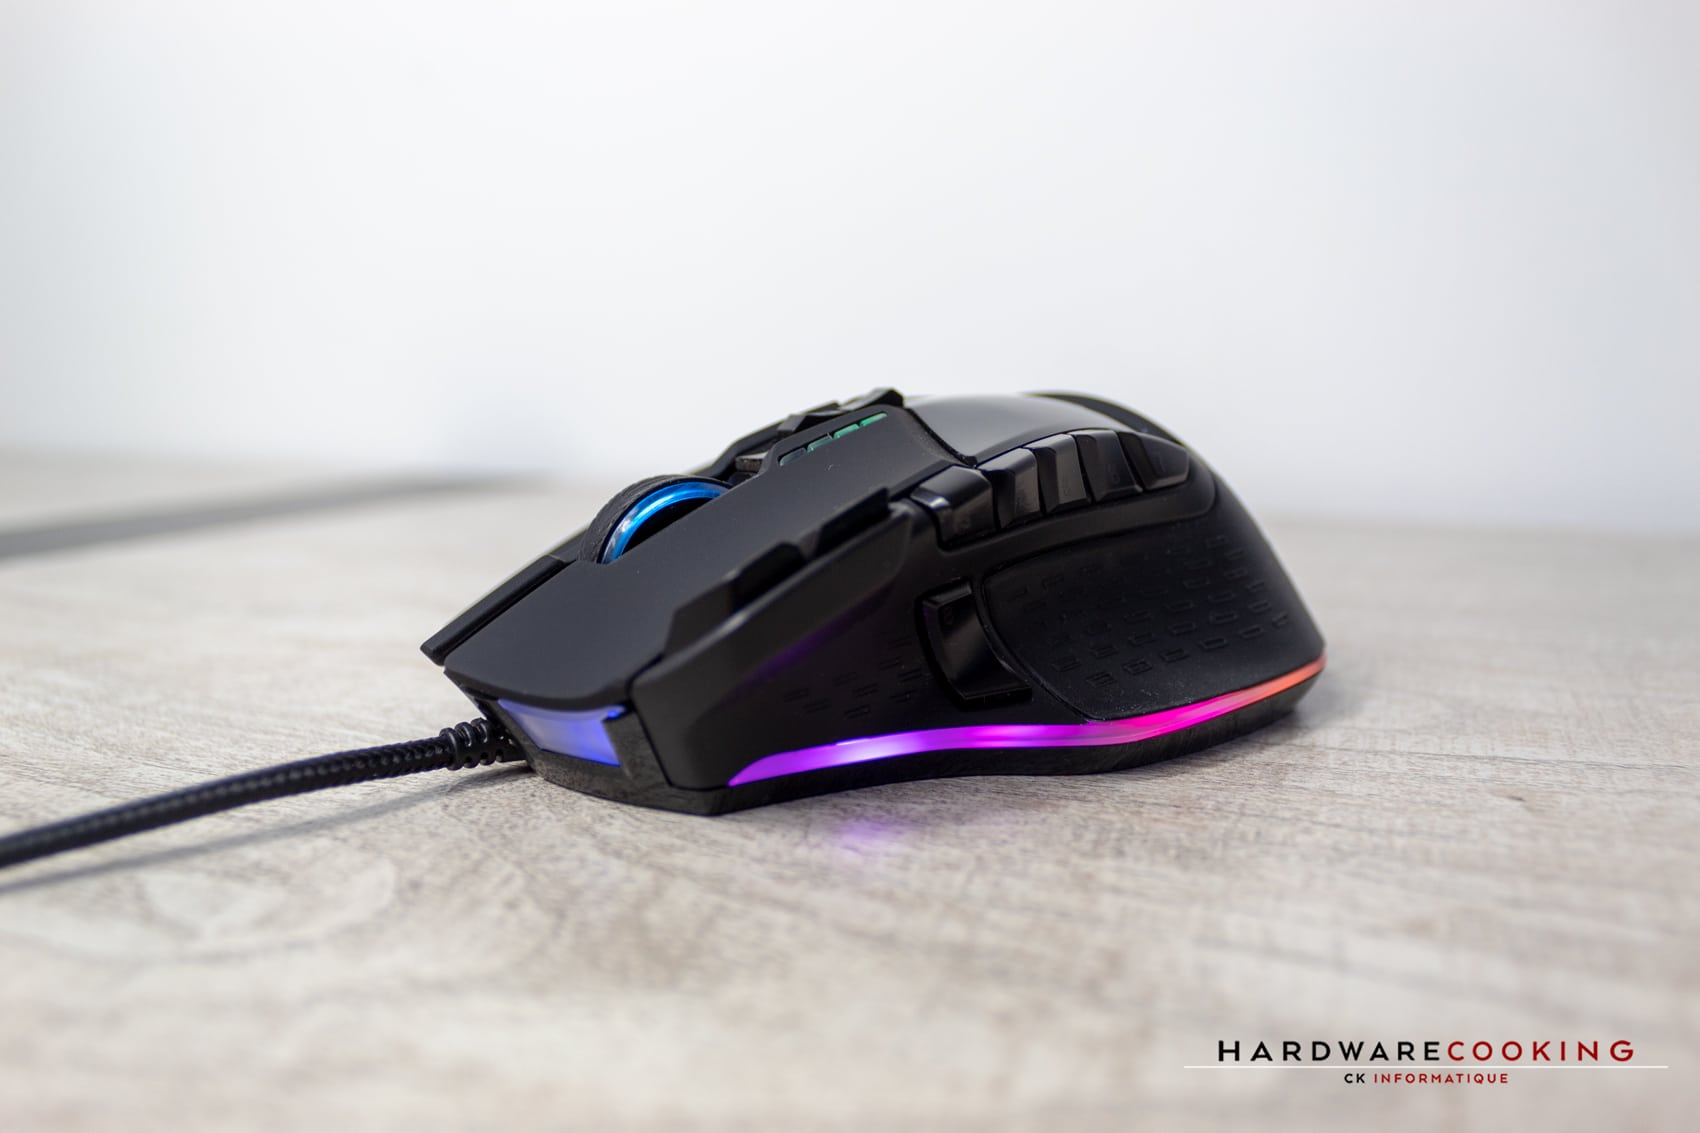 Test souris Patriot Viper V570 RGB Blackout Edition